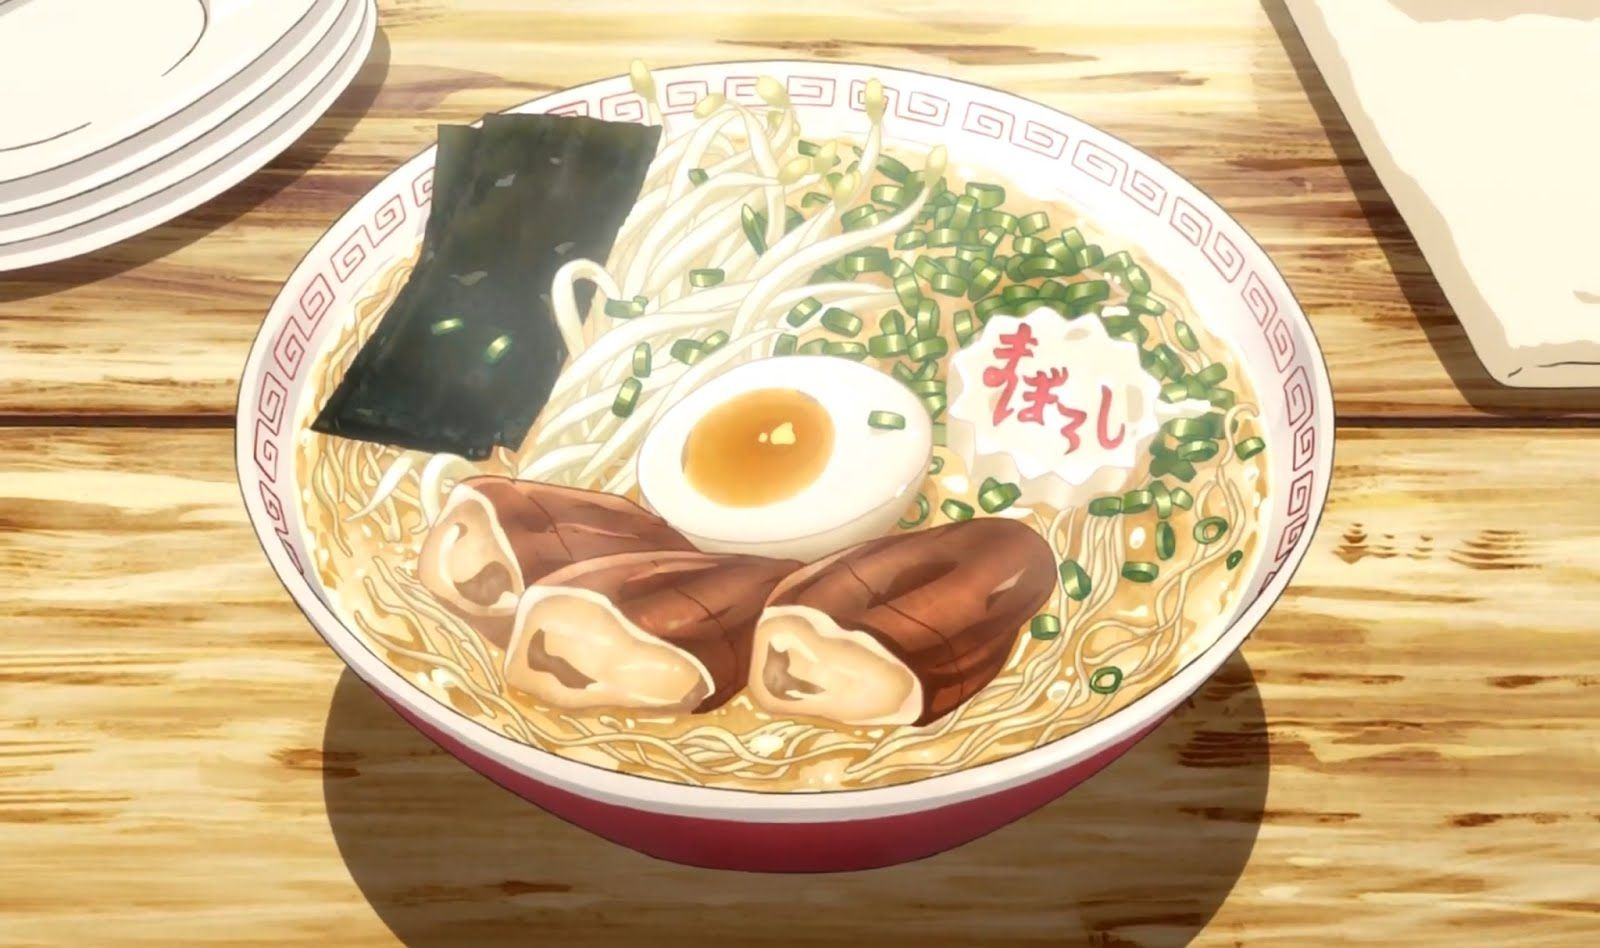 Making normal ramen look more appetizing. food anime